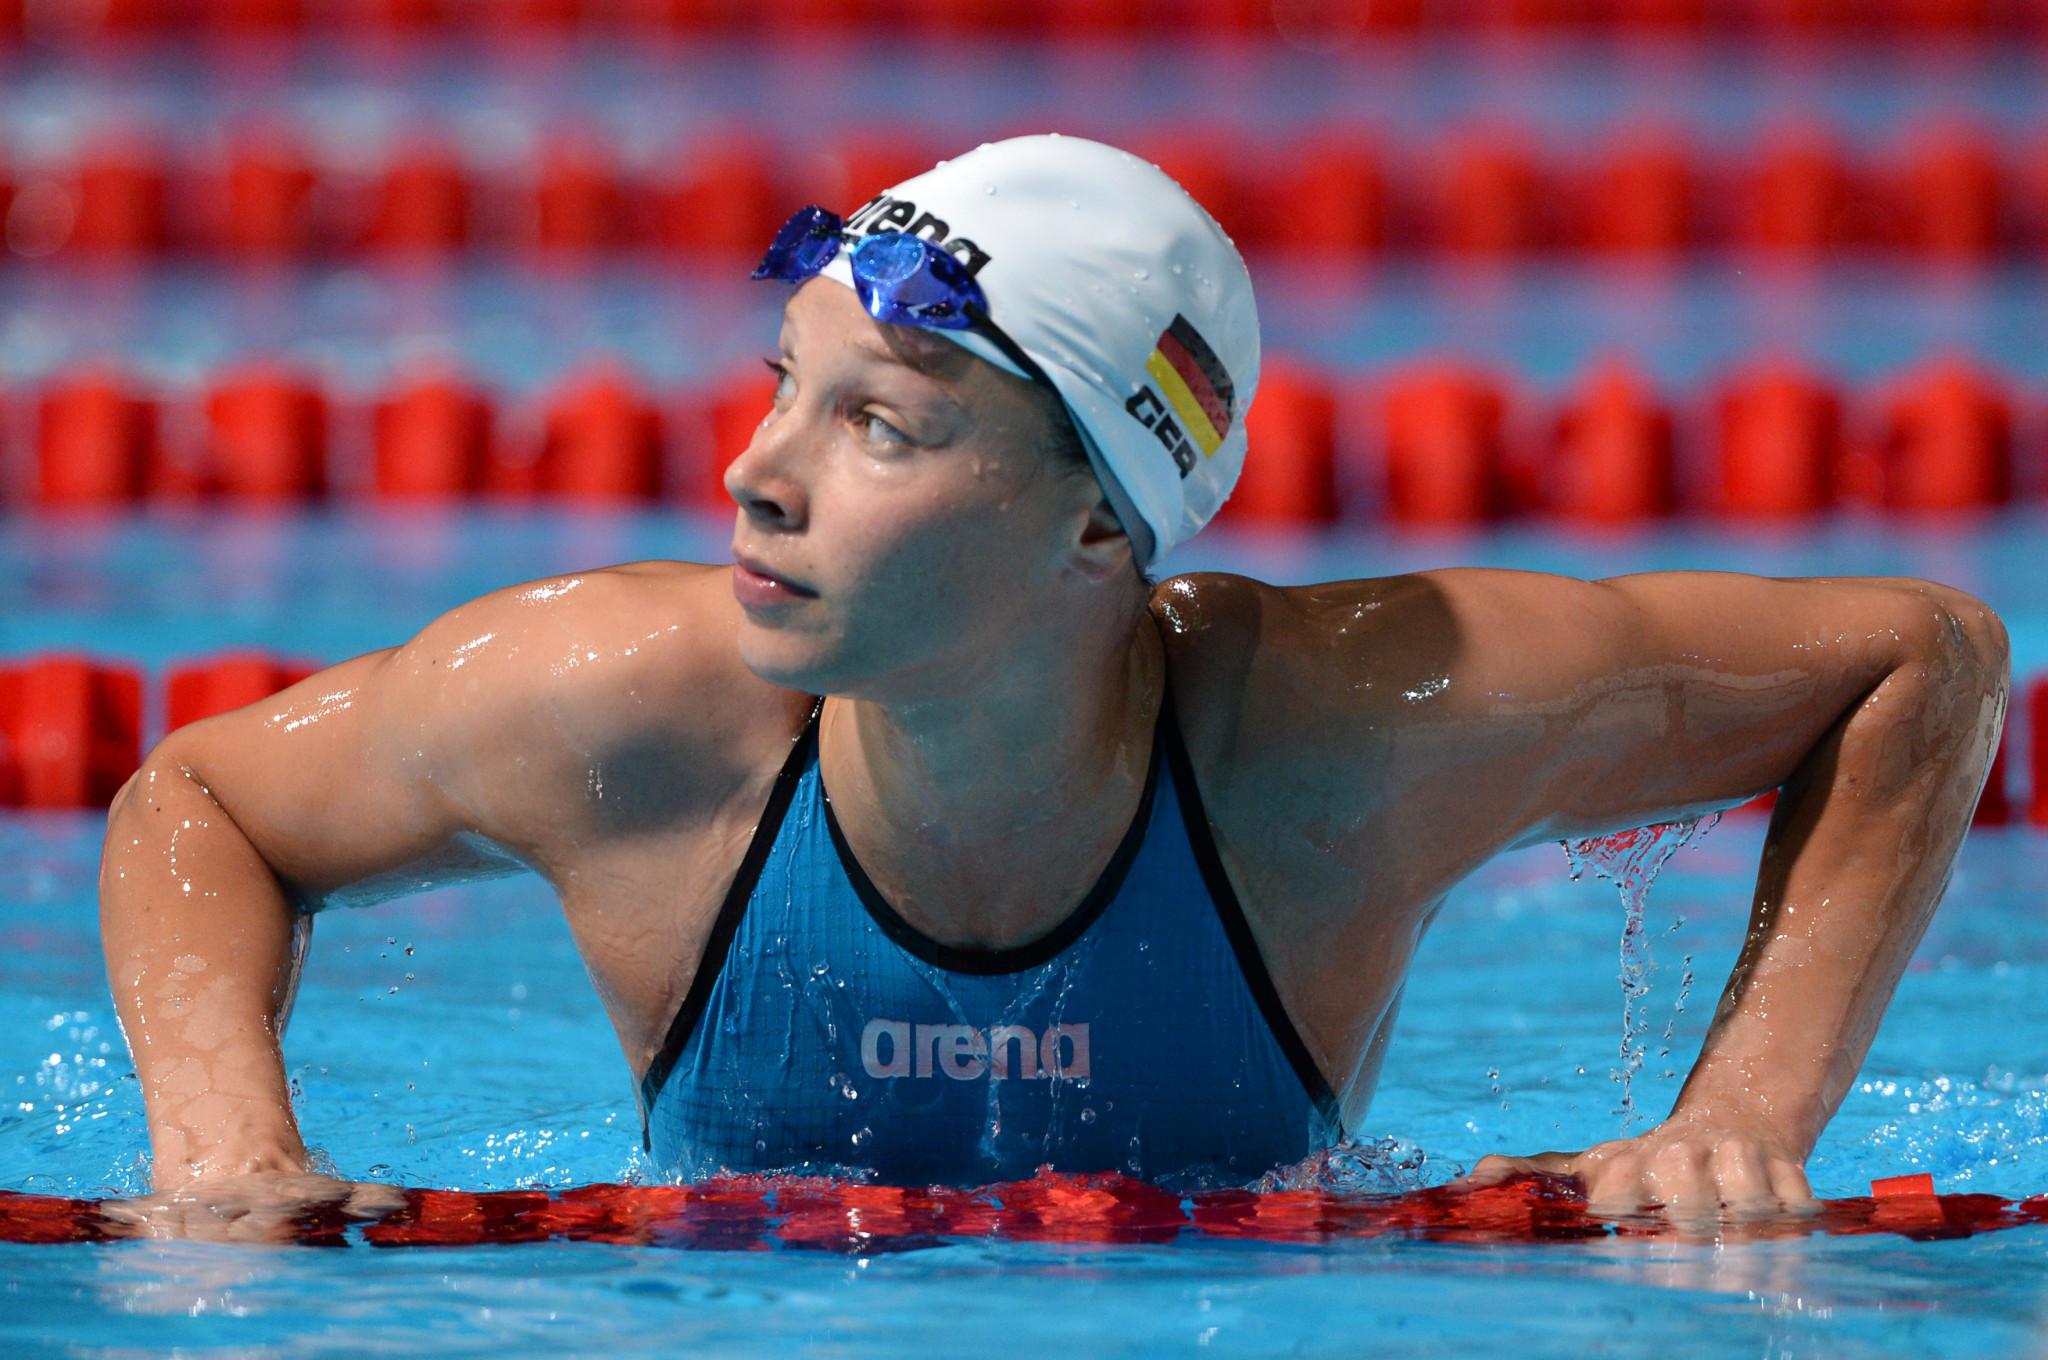 Olympic swimmer Brandt welcomes Rhine-Ruhr bid for 2025 World University Games